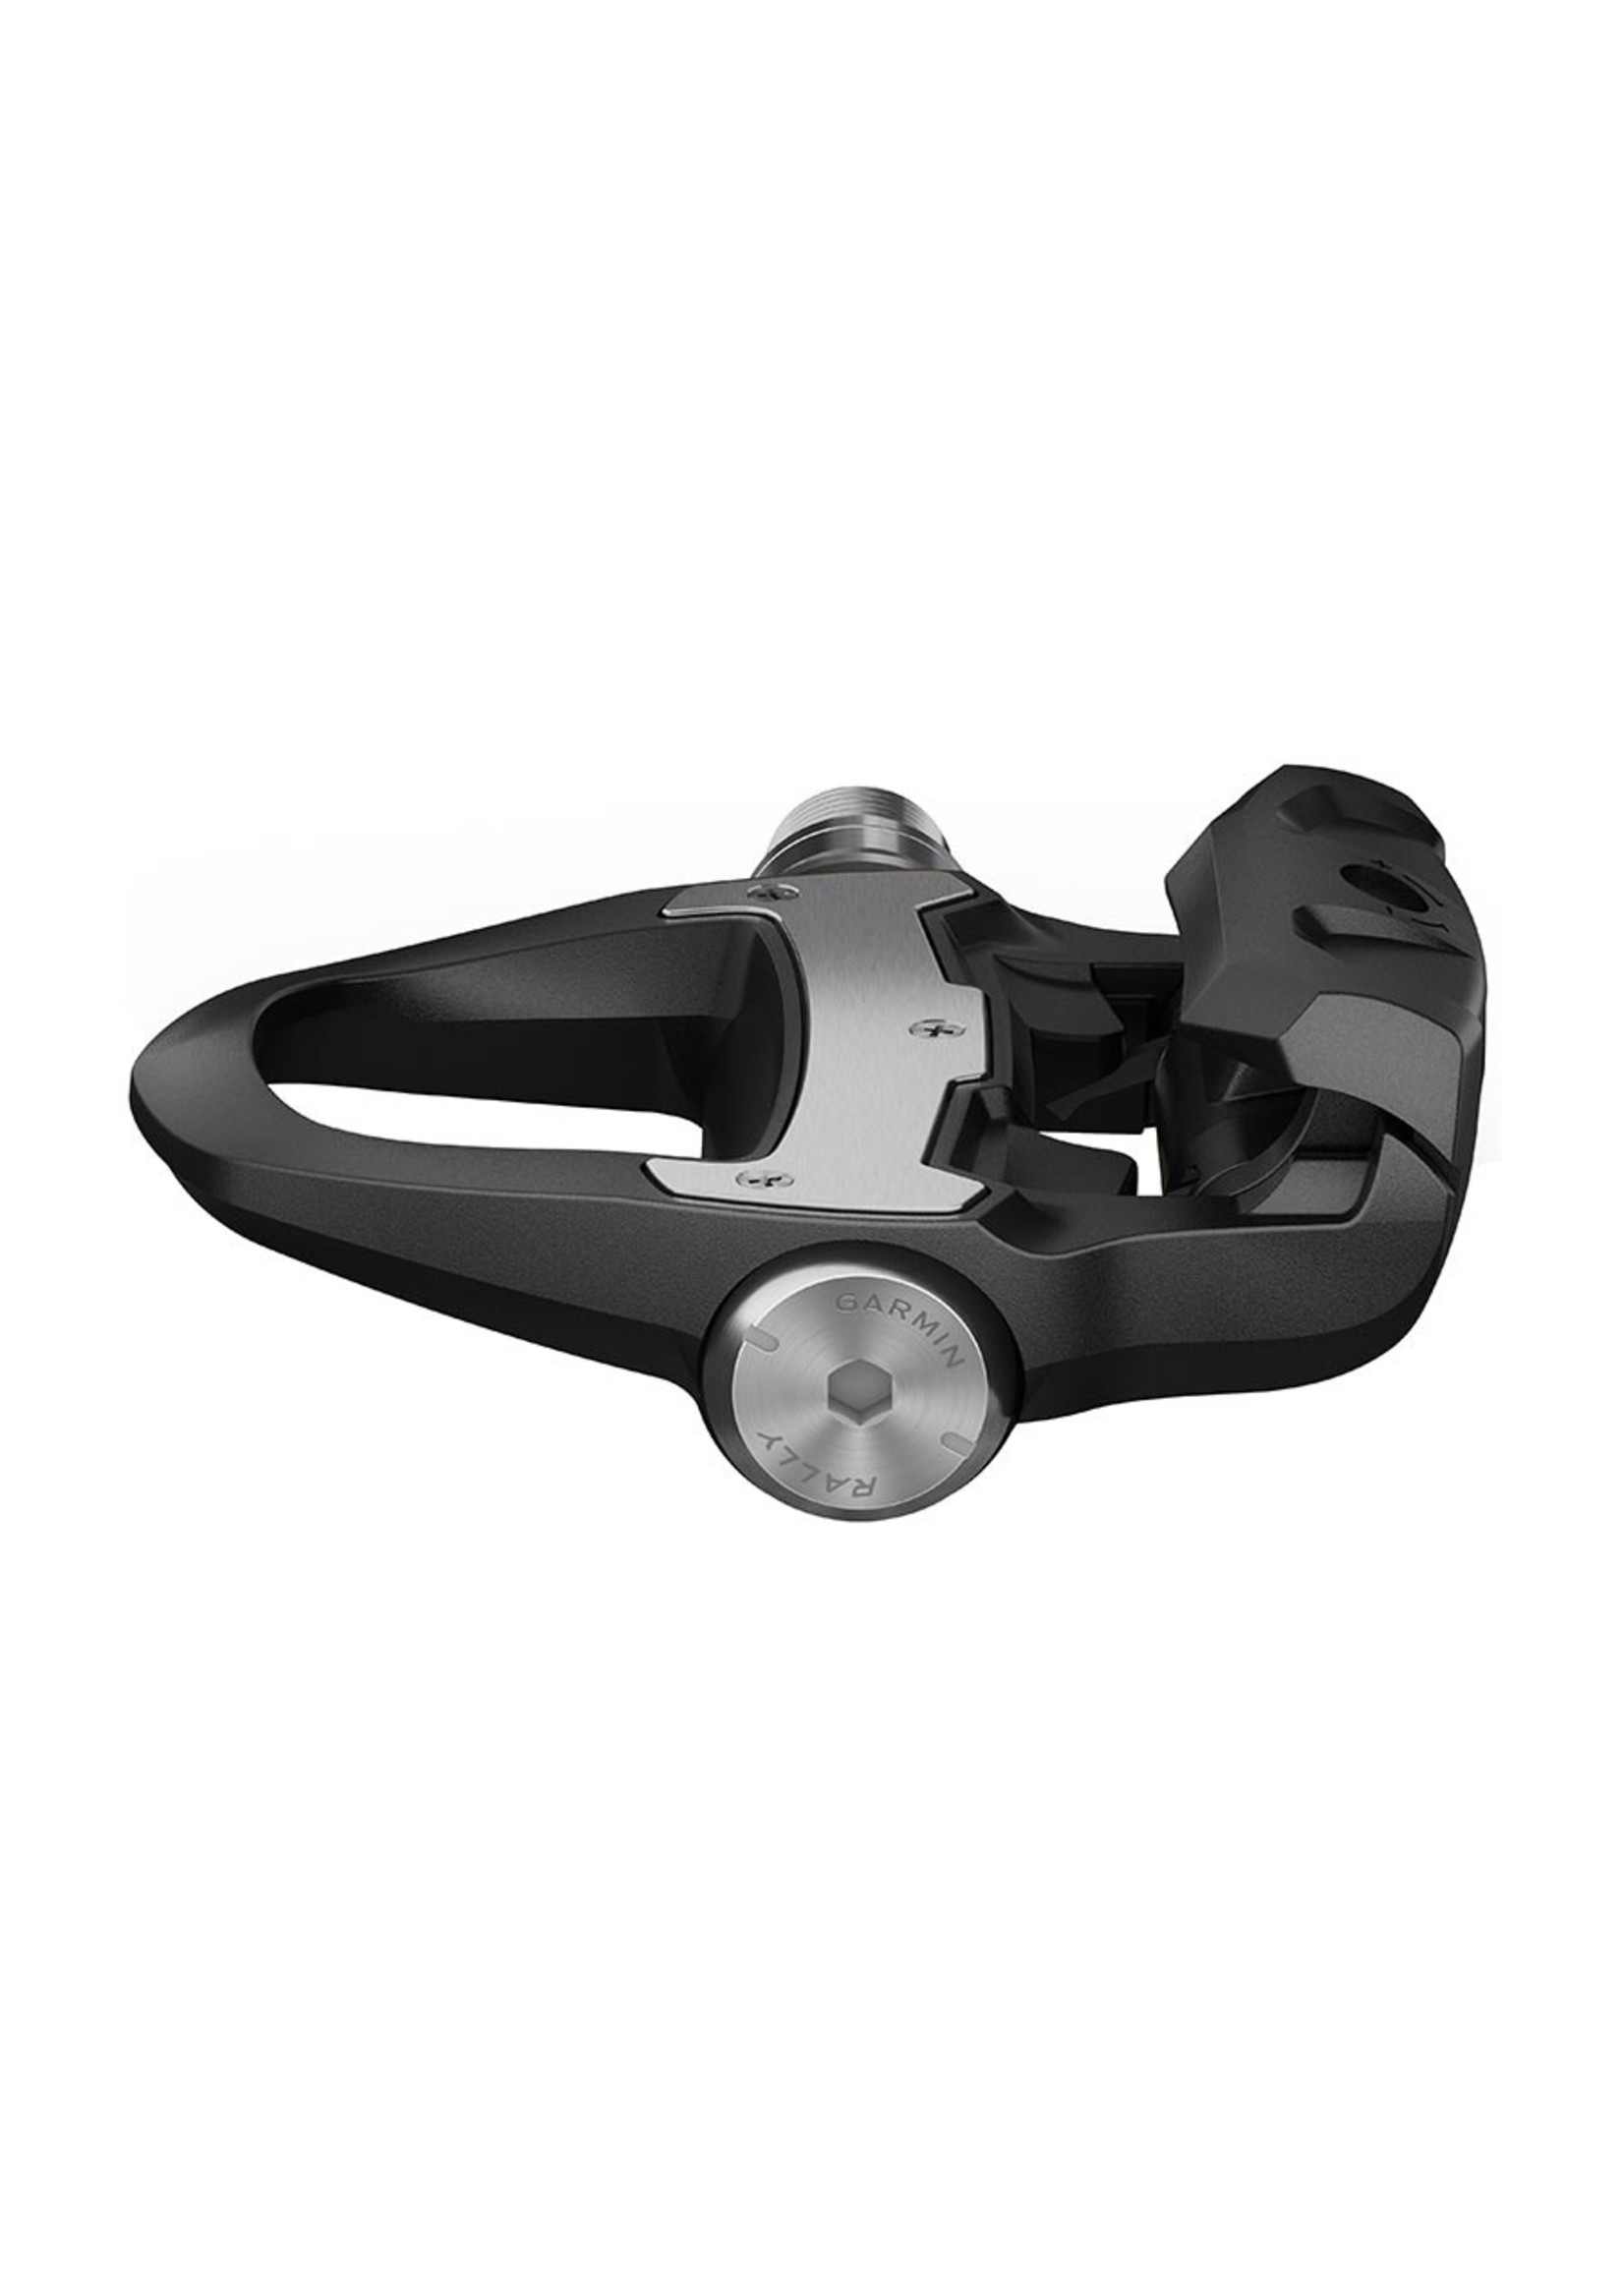 Garmin Garmin Rally RS Pédales, SPD-SL compatible, Black, Pair